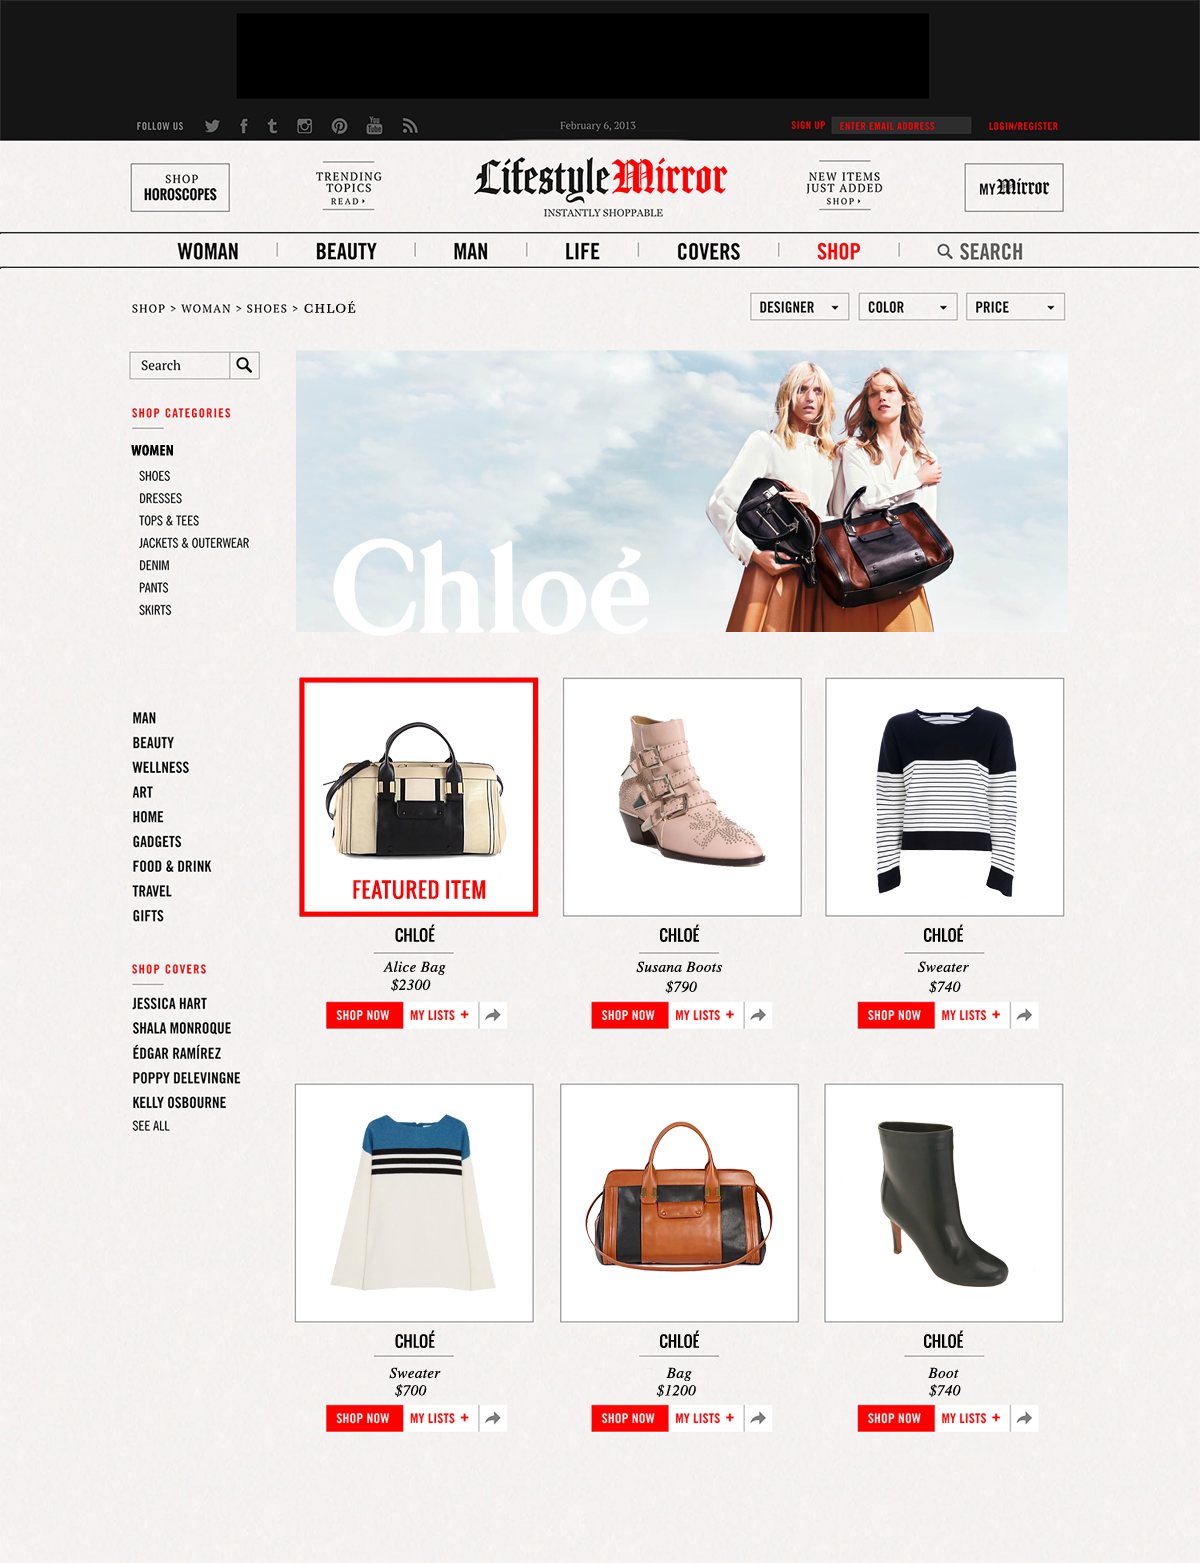 CHLOE Shopping Boutique.jpg